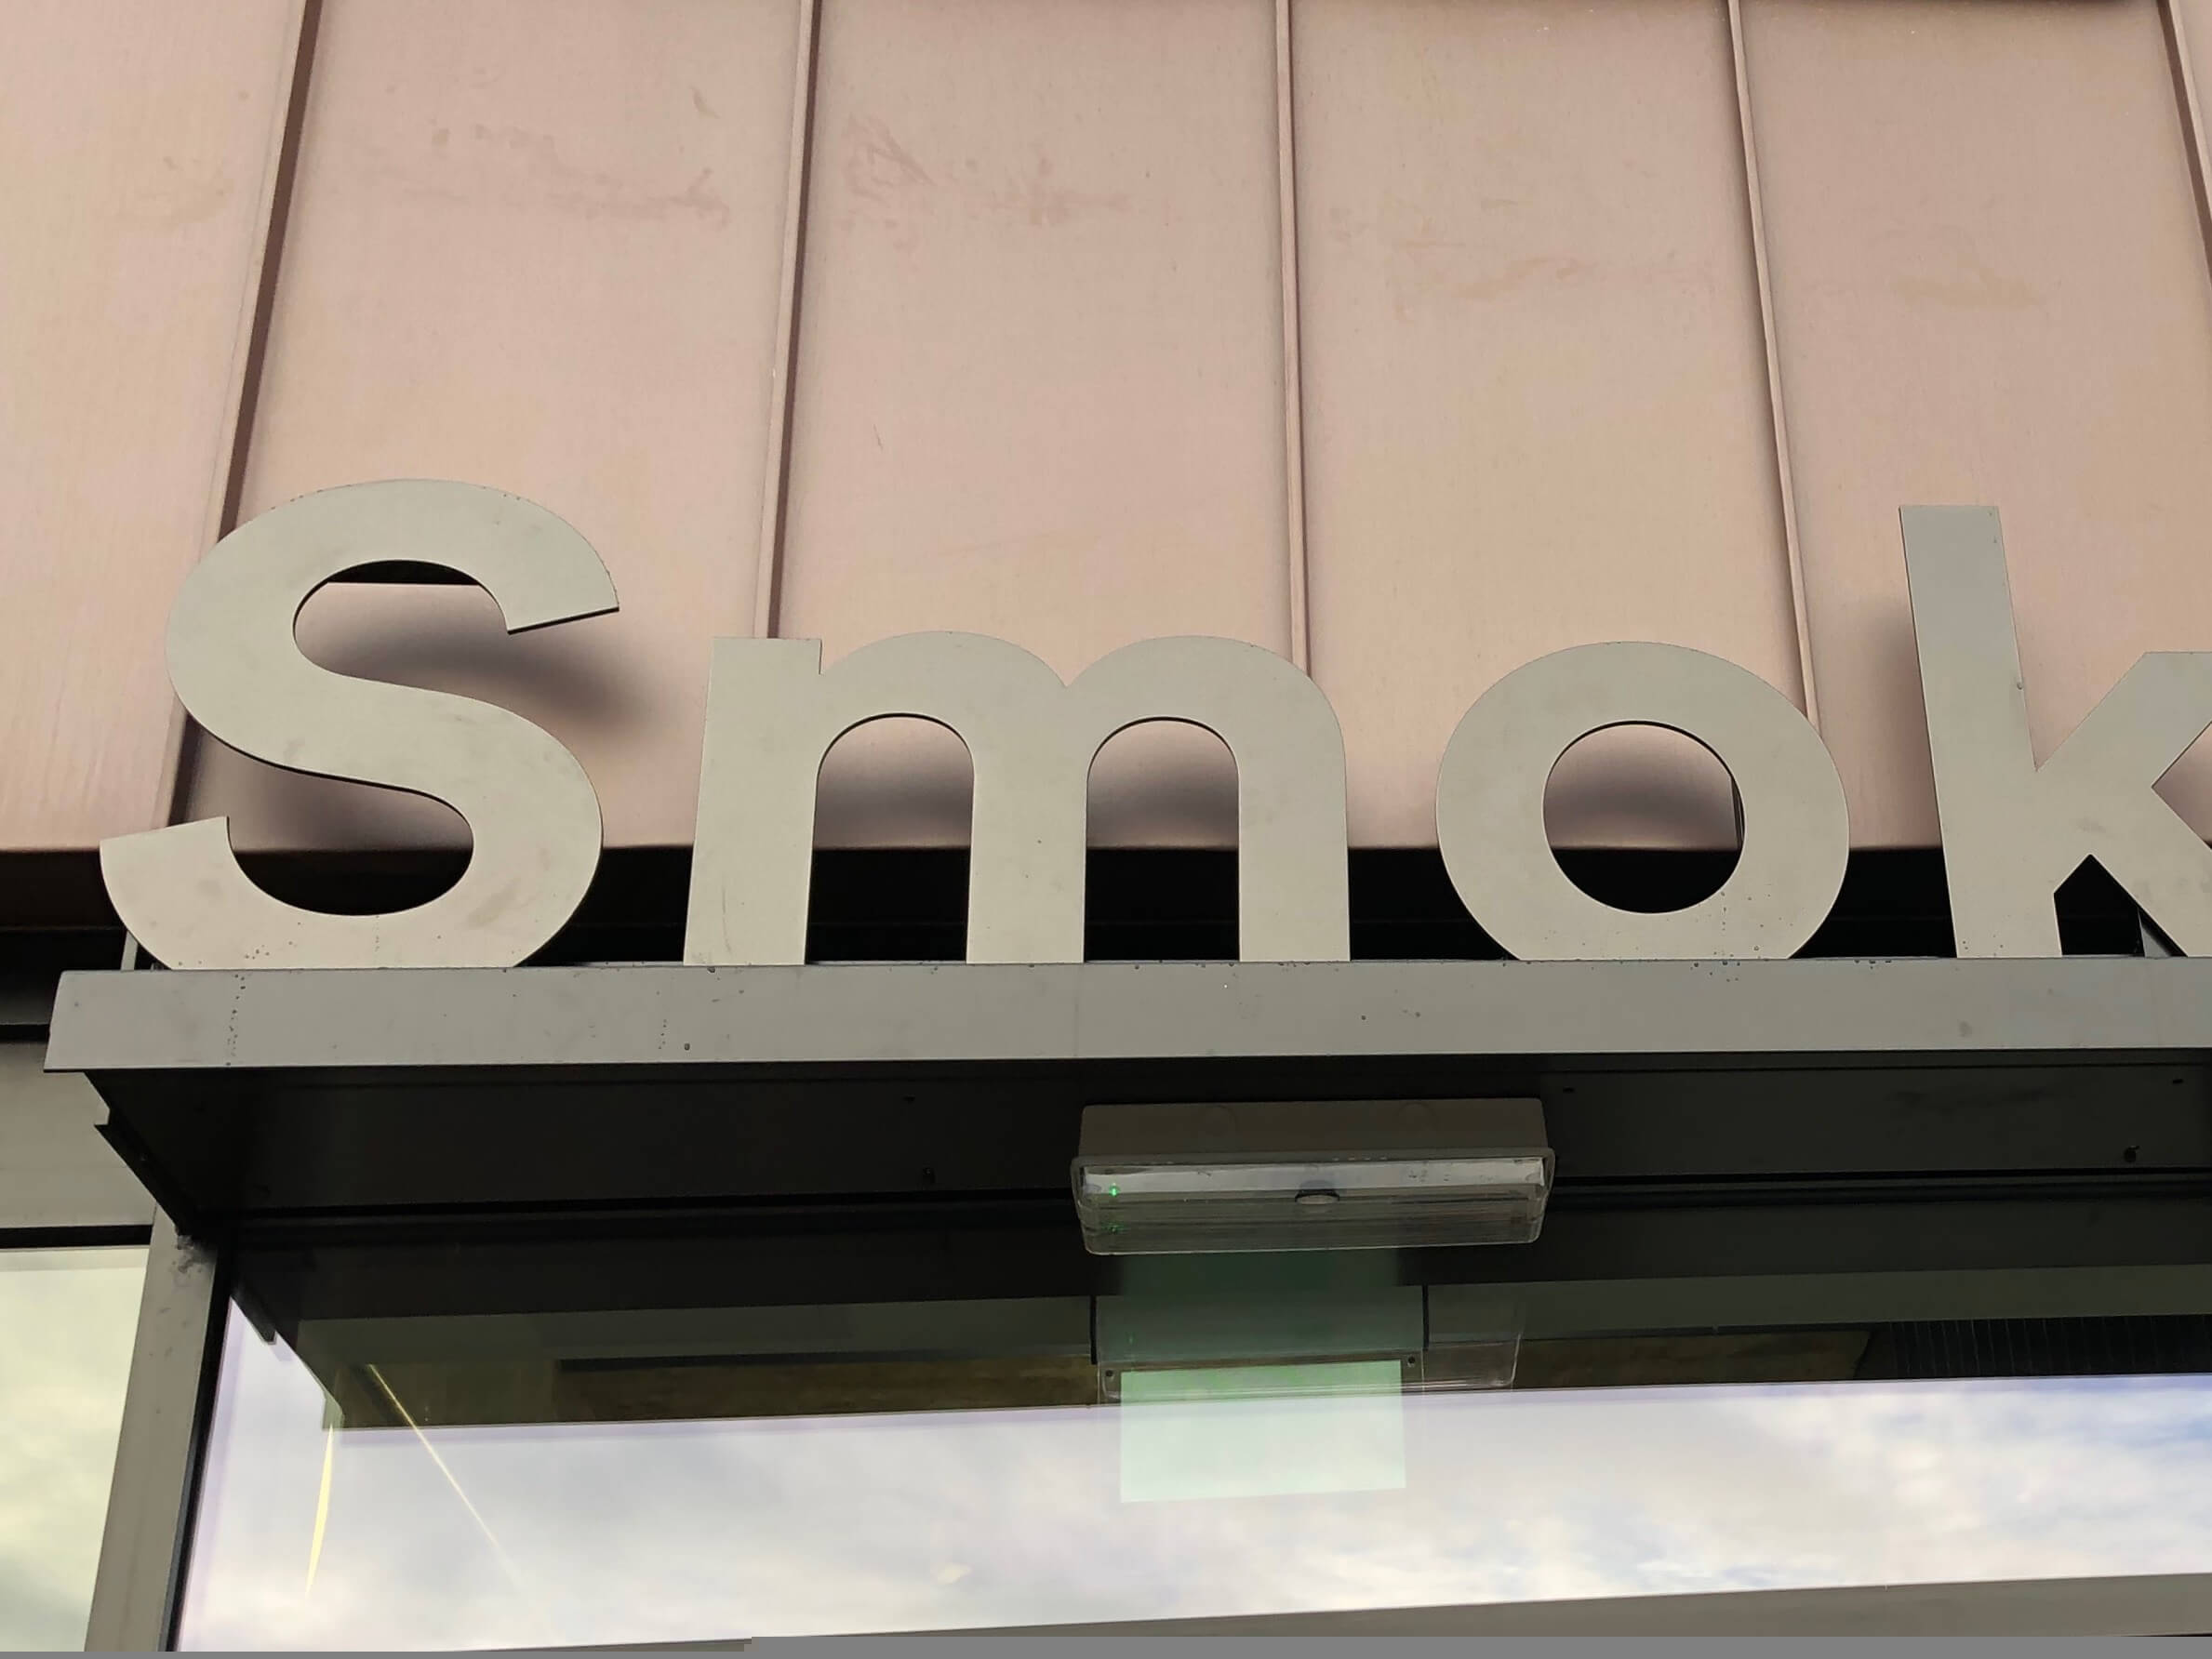 Smokehouses wayfinding and signage